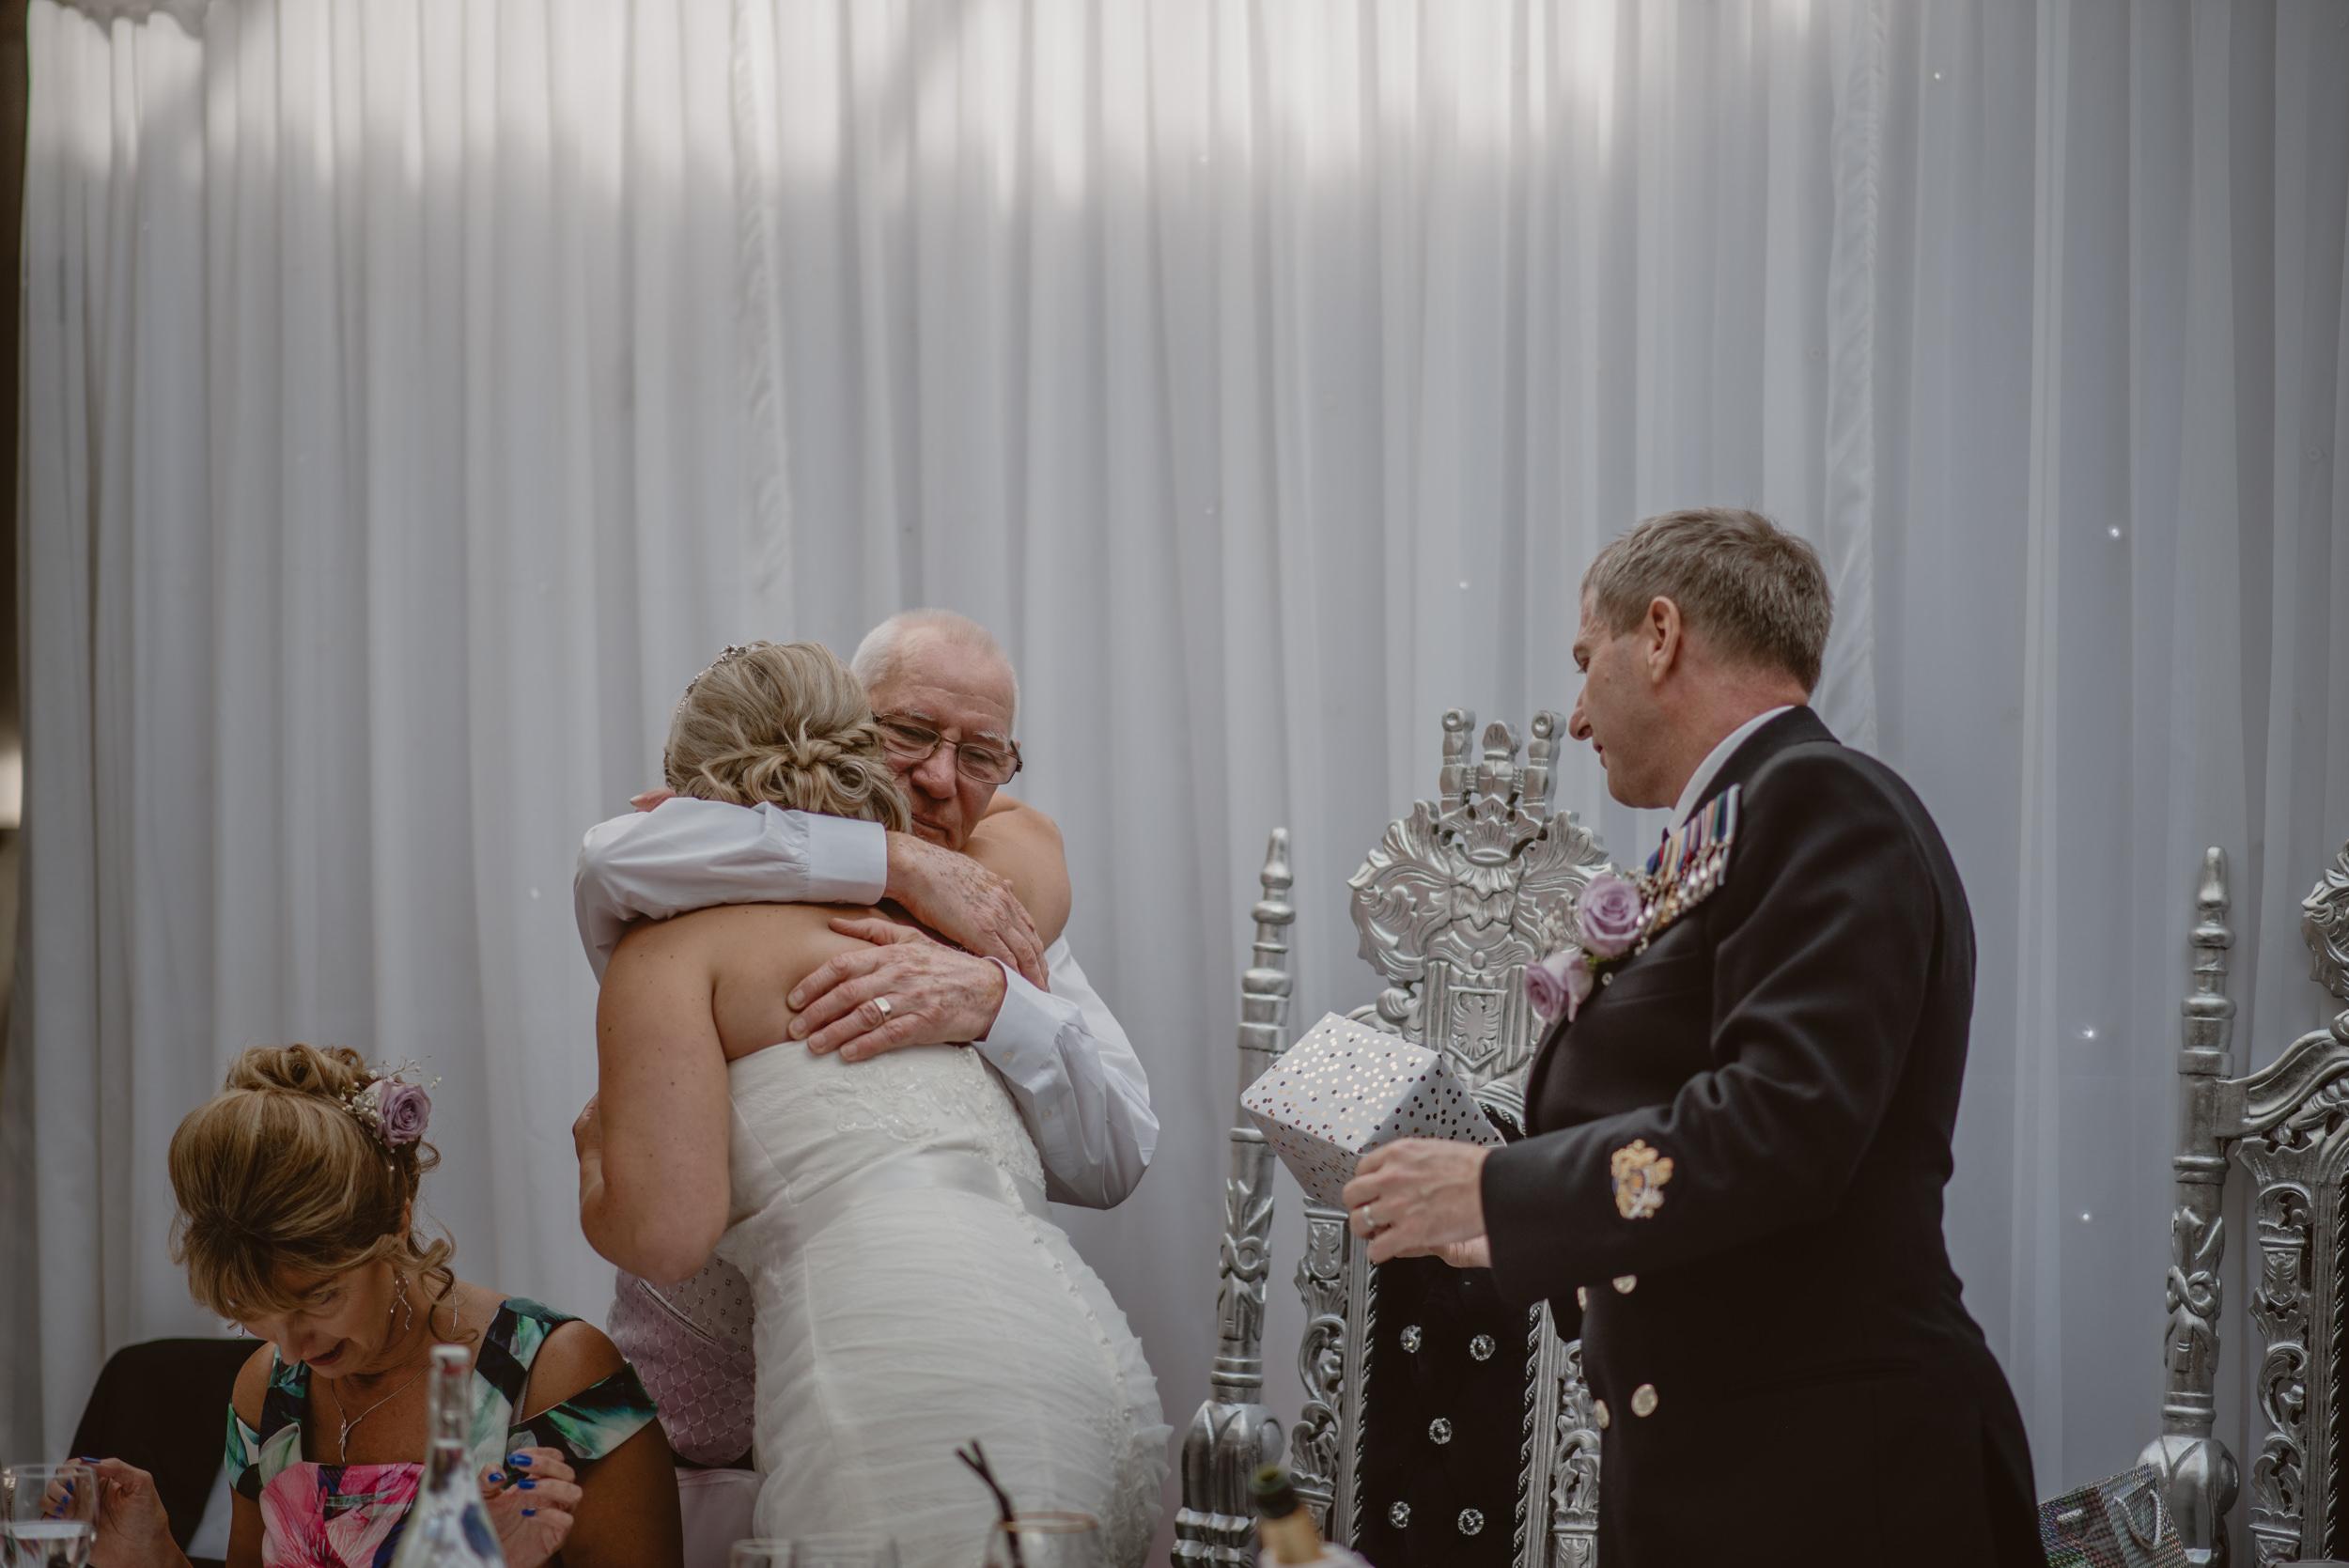 Chantelle-and-Stephen-Old-Thorns-Hotel-Wedding-Liphook-Manu-Mendoza-Wedding-Photography-383.jpg